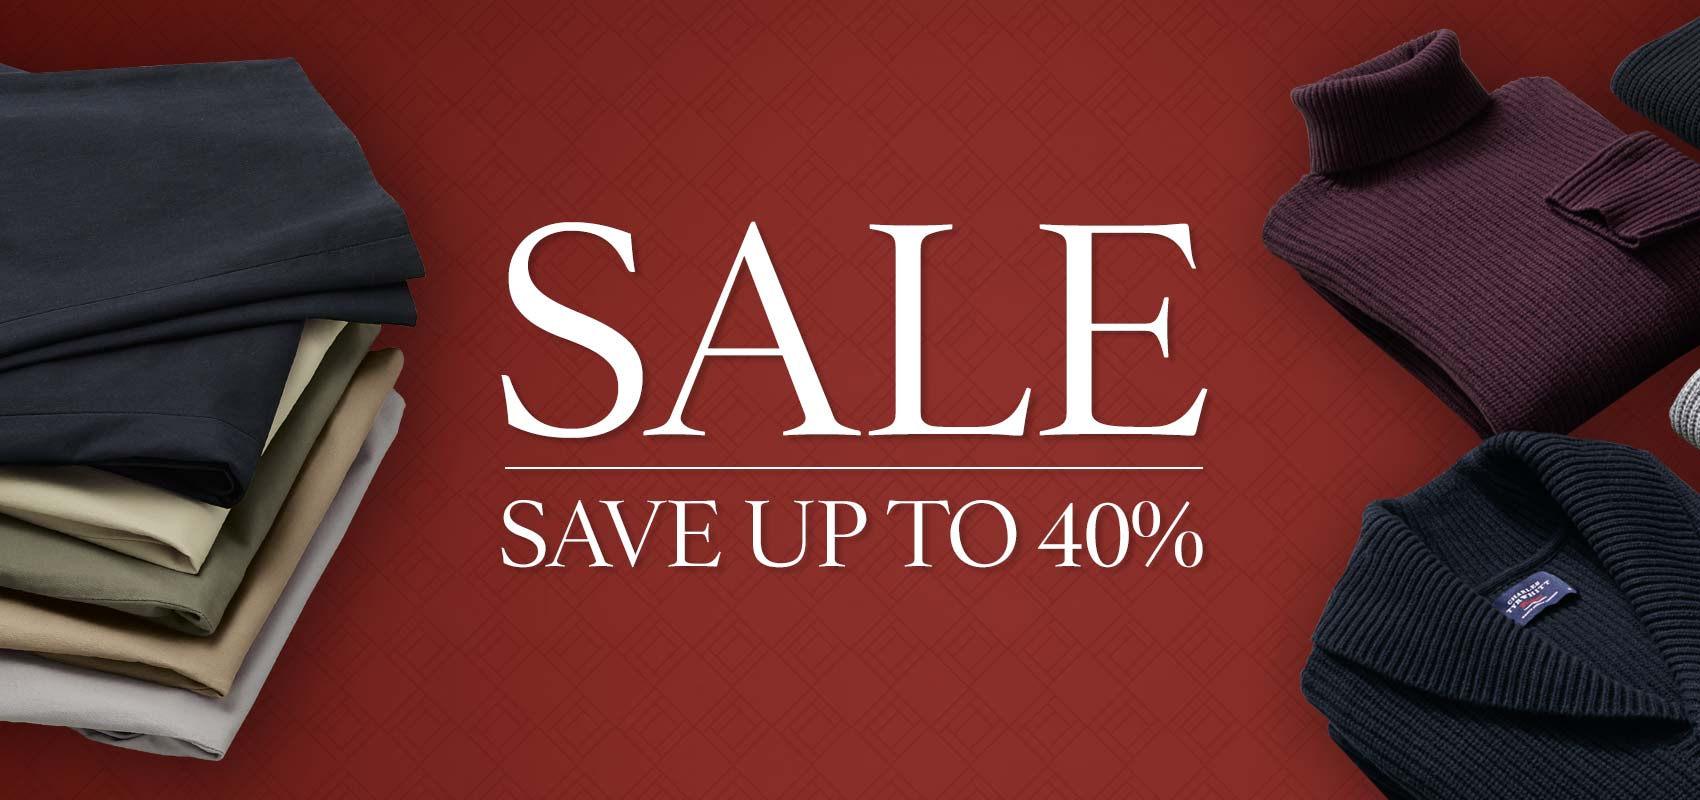 Charles Tyrwhitt casualwear sale